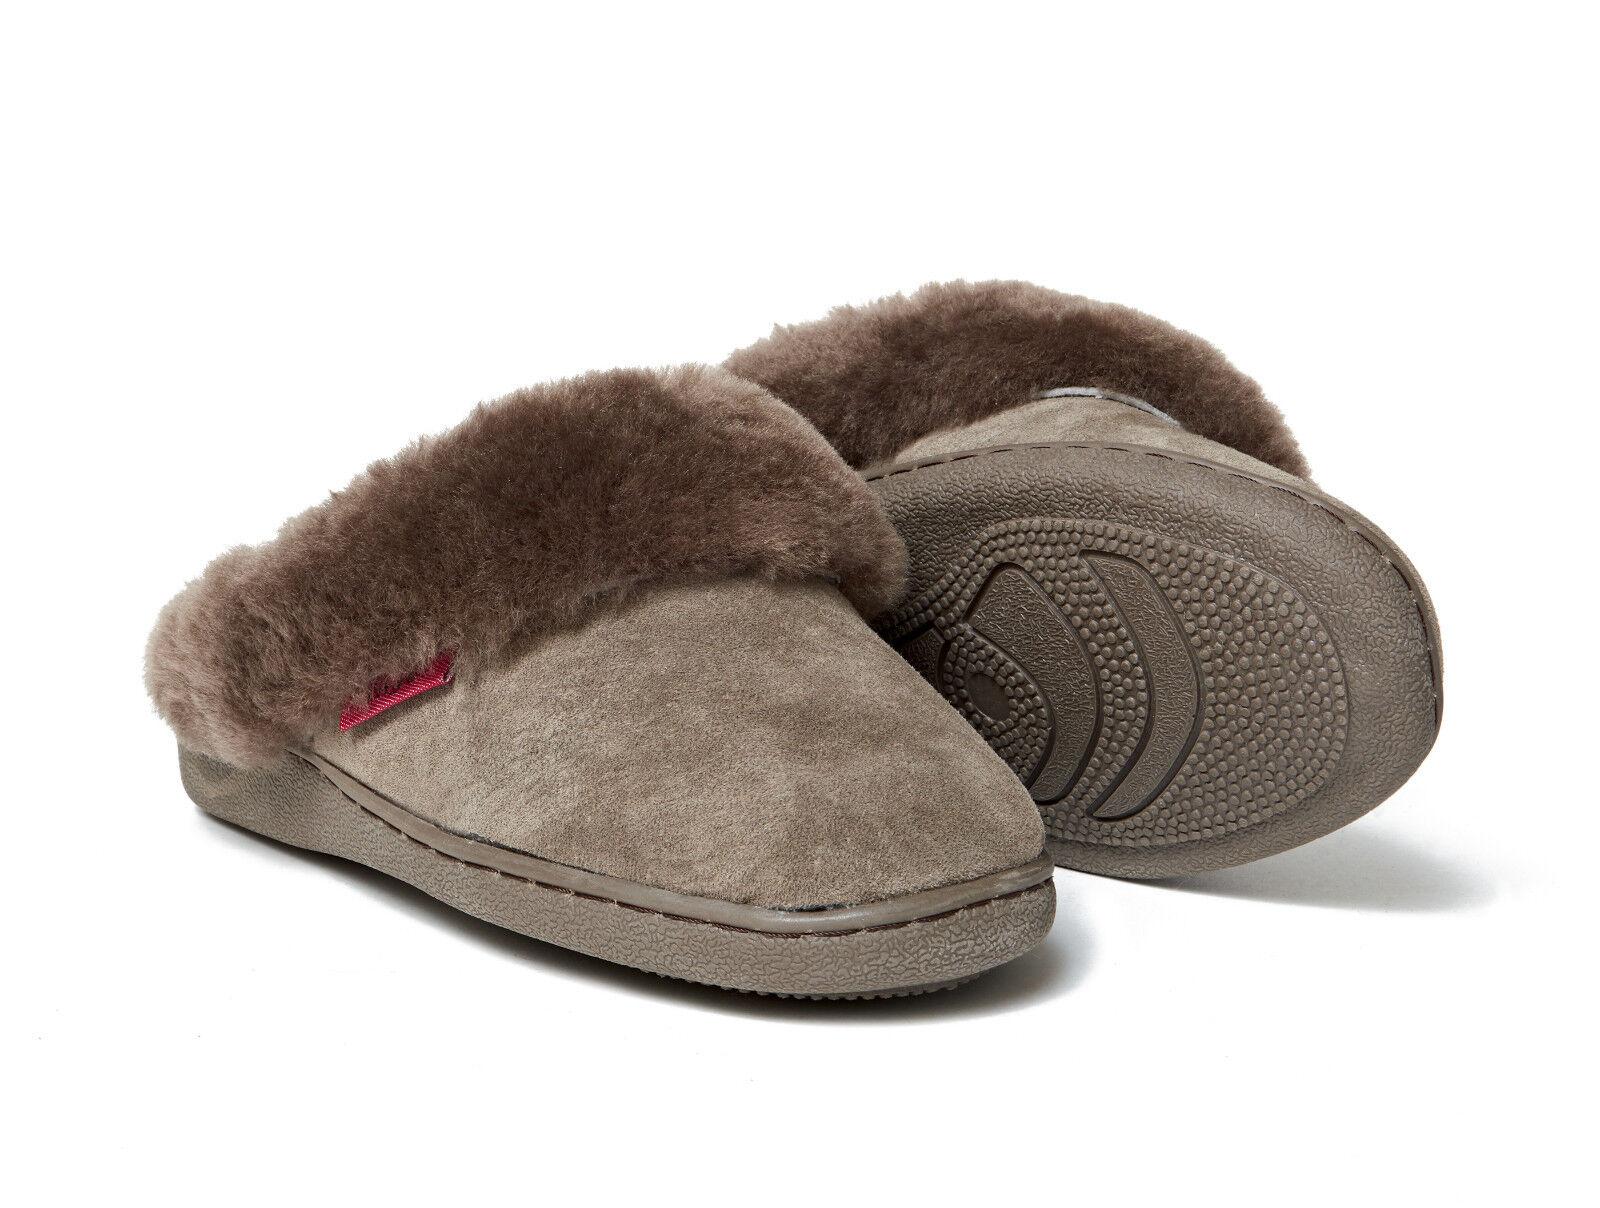 Lammfell Pantoffeln Korfu braun dick Damen + warme Hausschuhe Damen dick Herren Fell 36-48 db5f2e